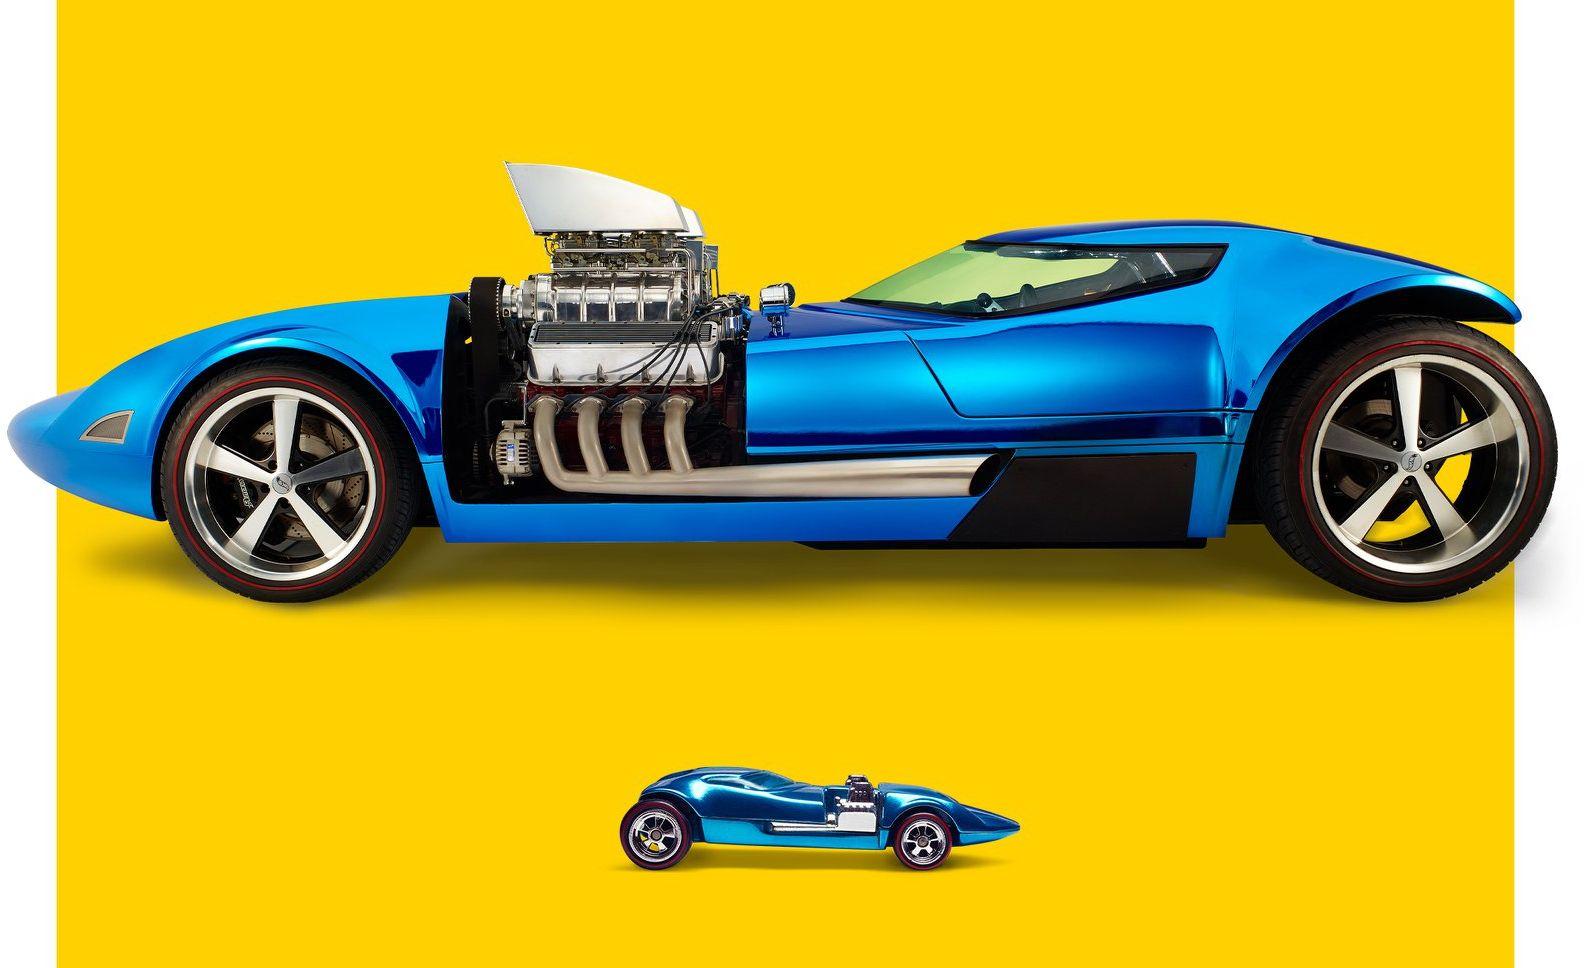 Hot Wheels Mattel Dream Mobile 1:64 Kids Diecast Model Toy Car HW Dream Garage